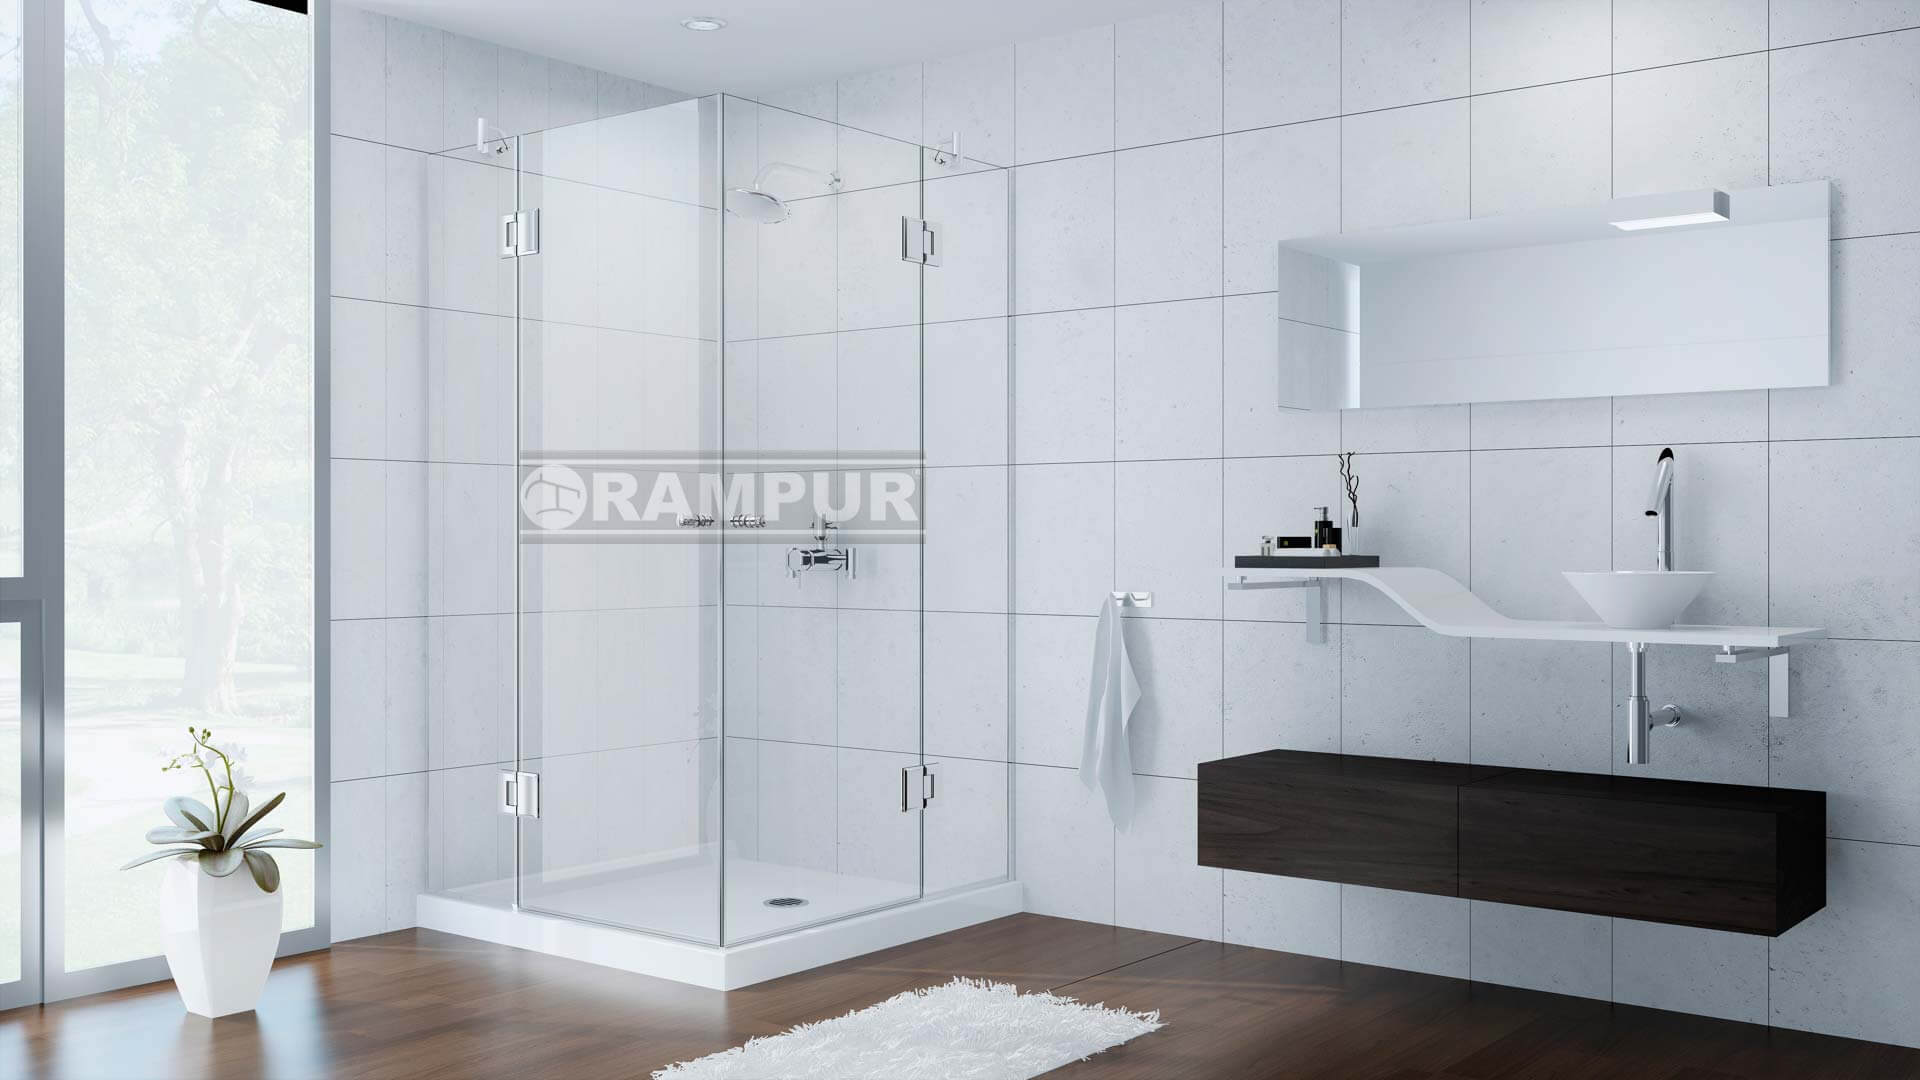 Rampur box para ducha de vidrio epuyen premium - Vidrios para duchas ...